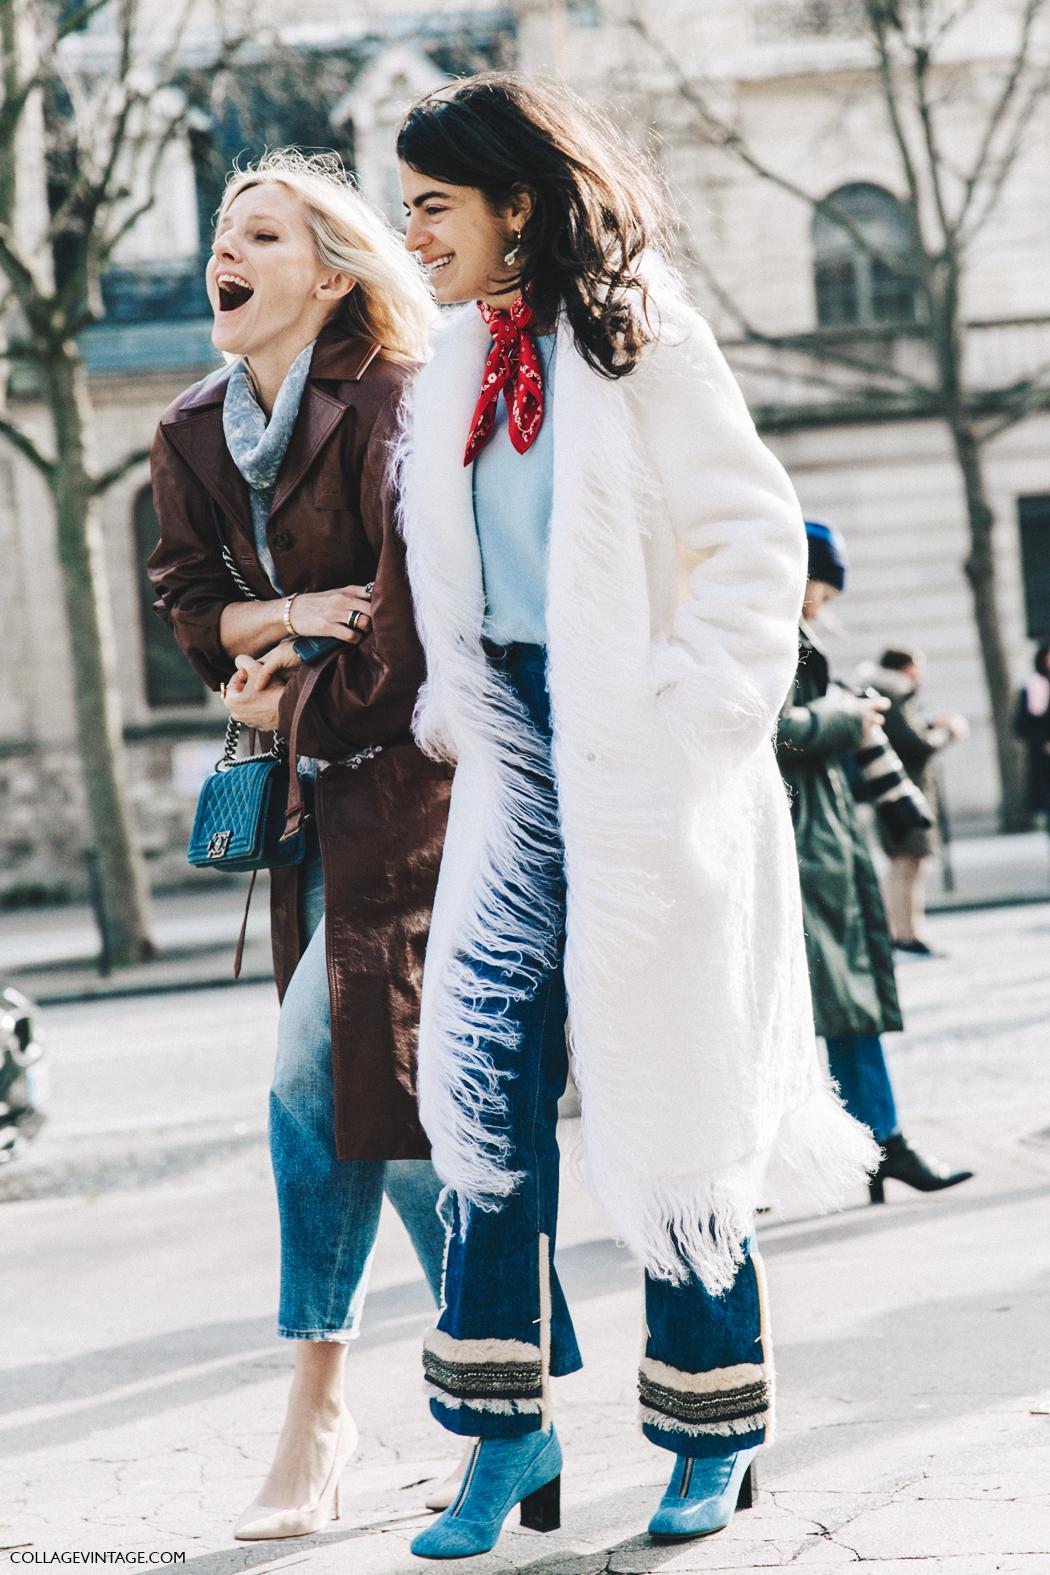 PFW-Paris_Fashion_Week_Fall_2016-Street_Style-Collage_Vintage-Leandra_Medine-